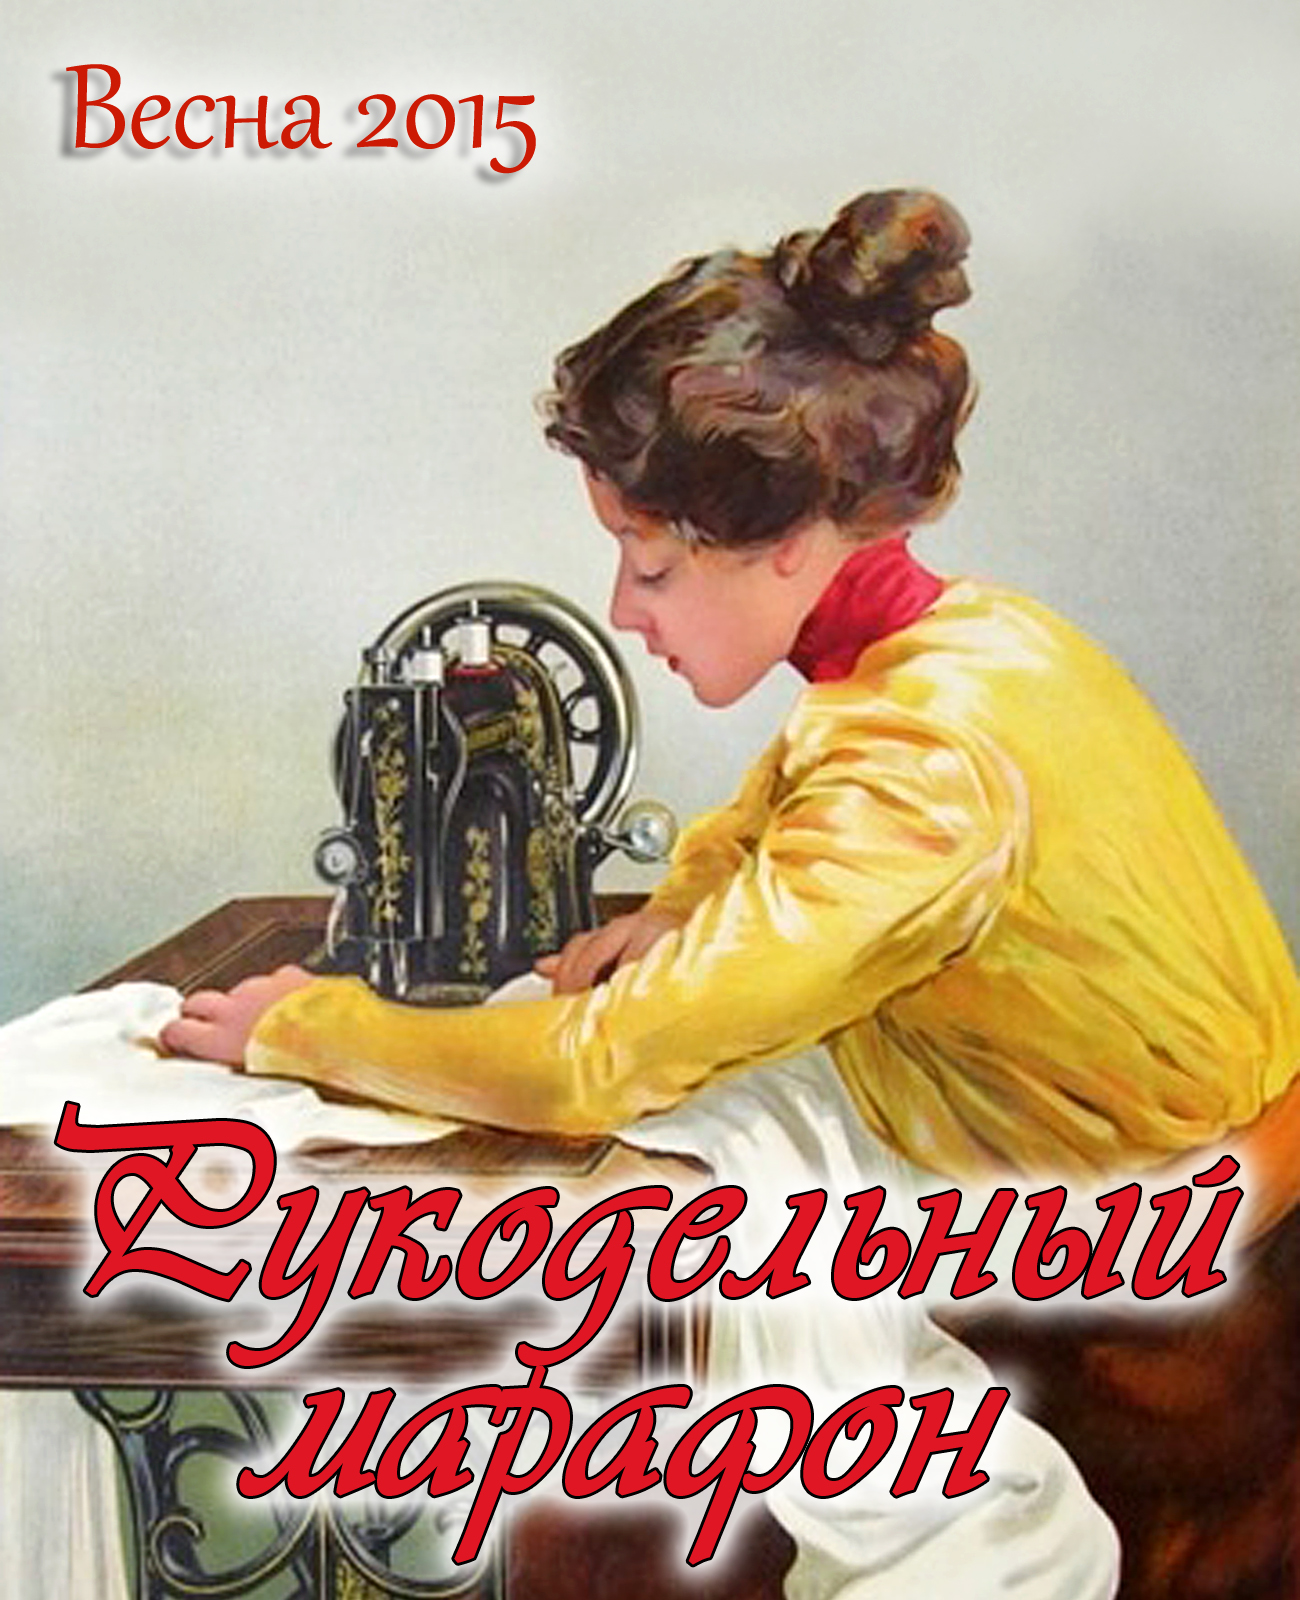 http://annakazantseva.blogspot.ru/2015/03/blog-post.html?m=0